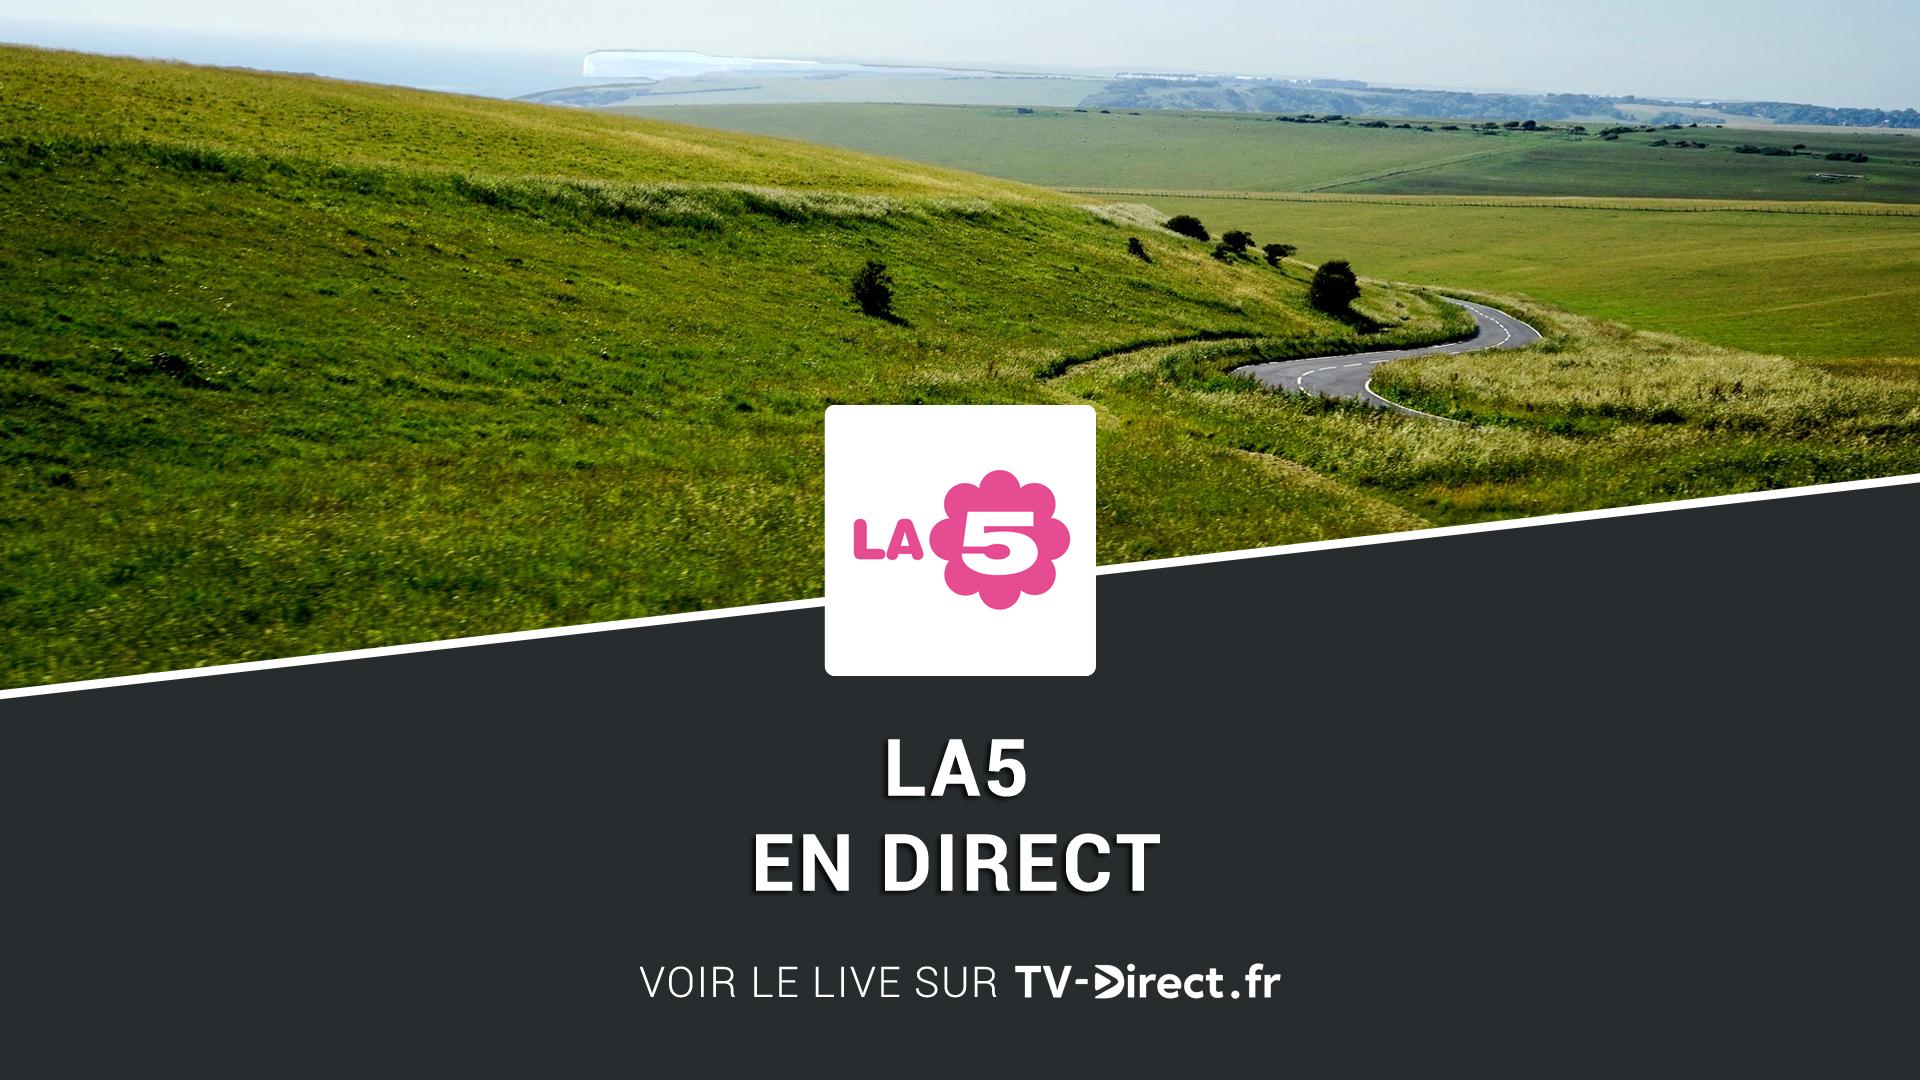 https://www.tv-direct.fr/live/numero-23